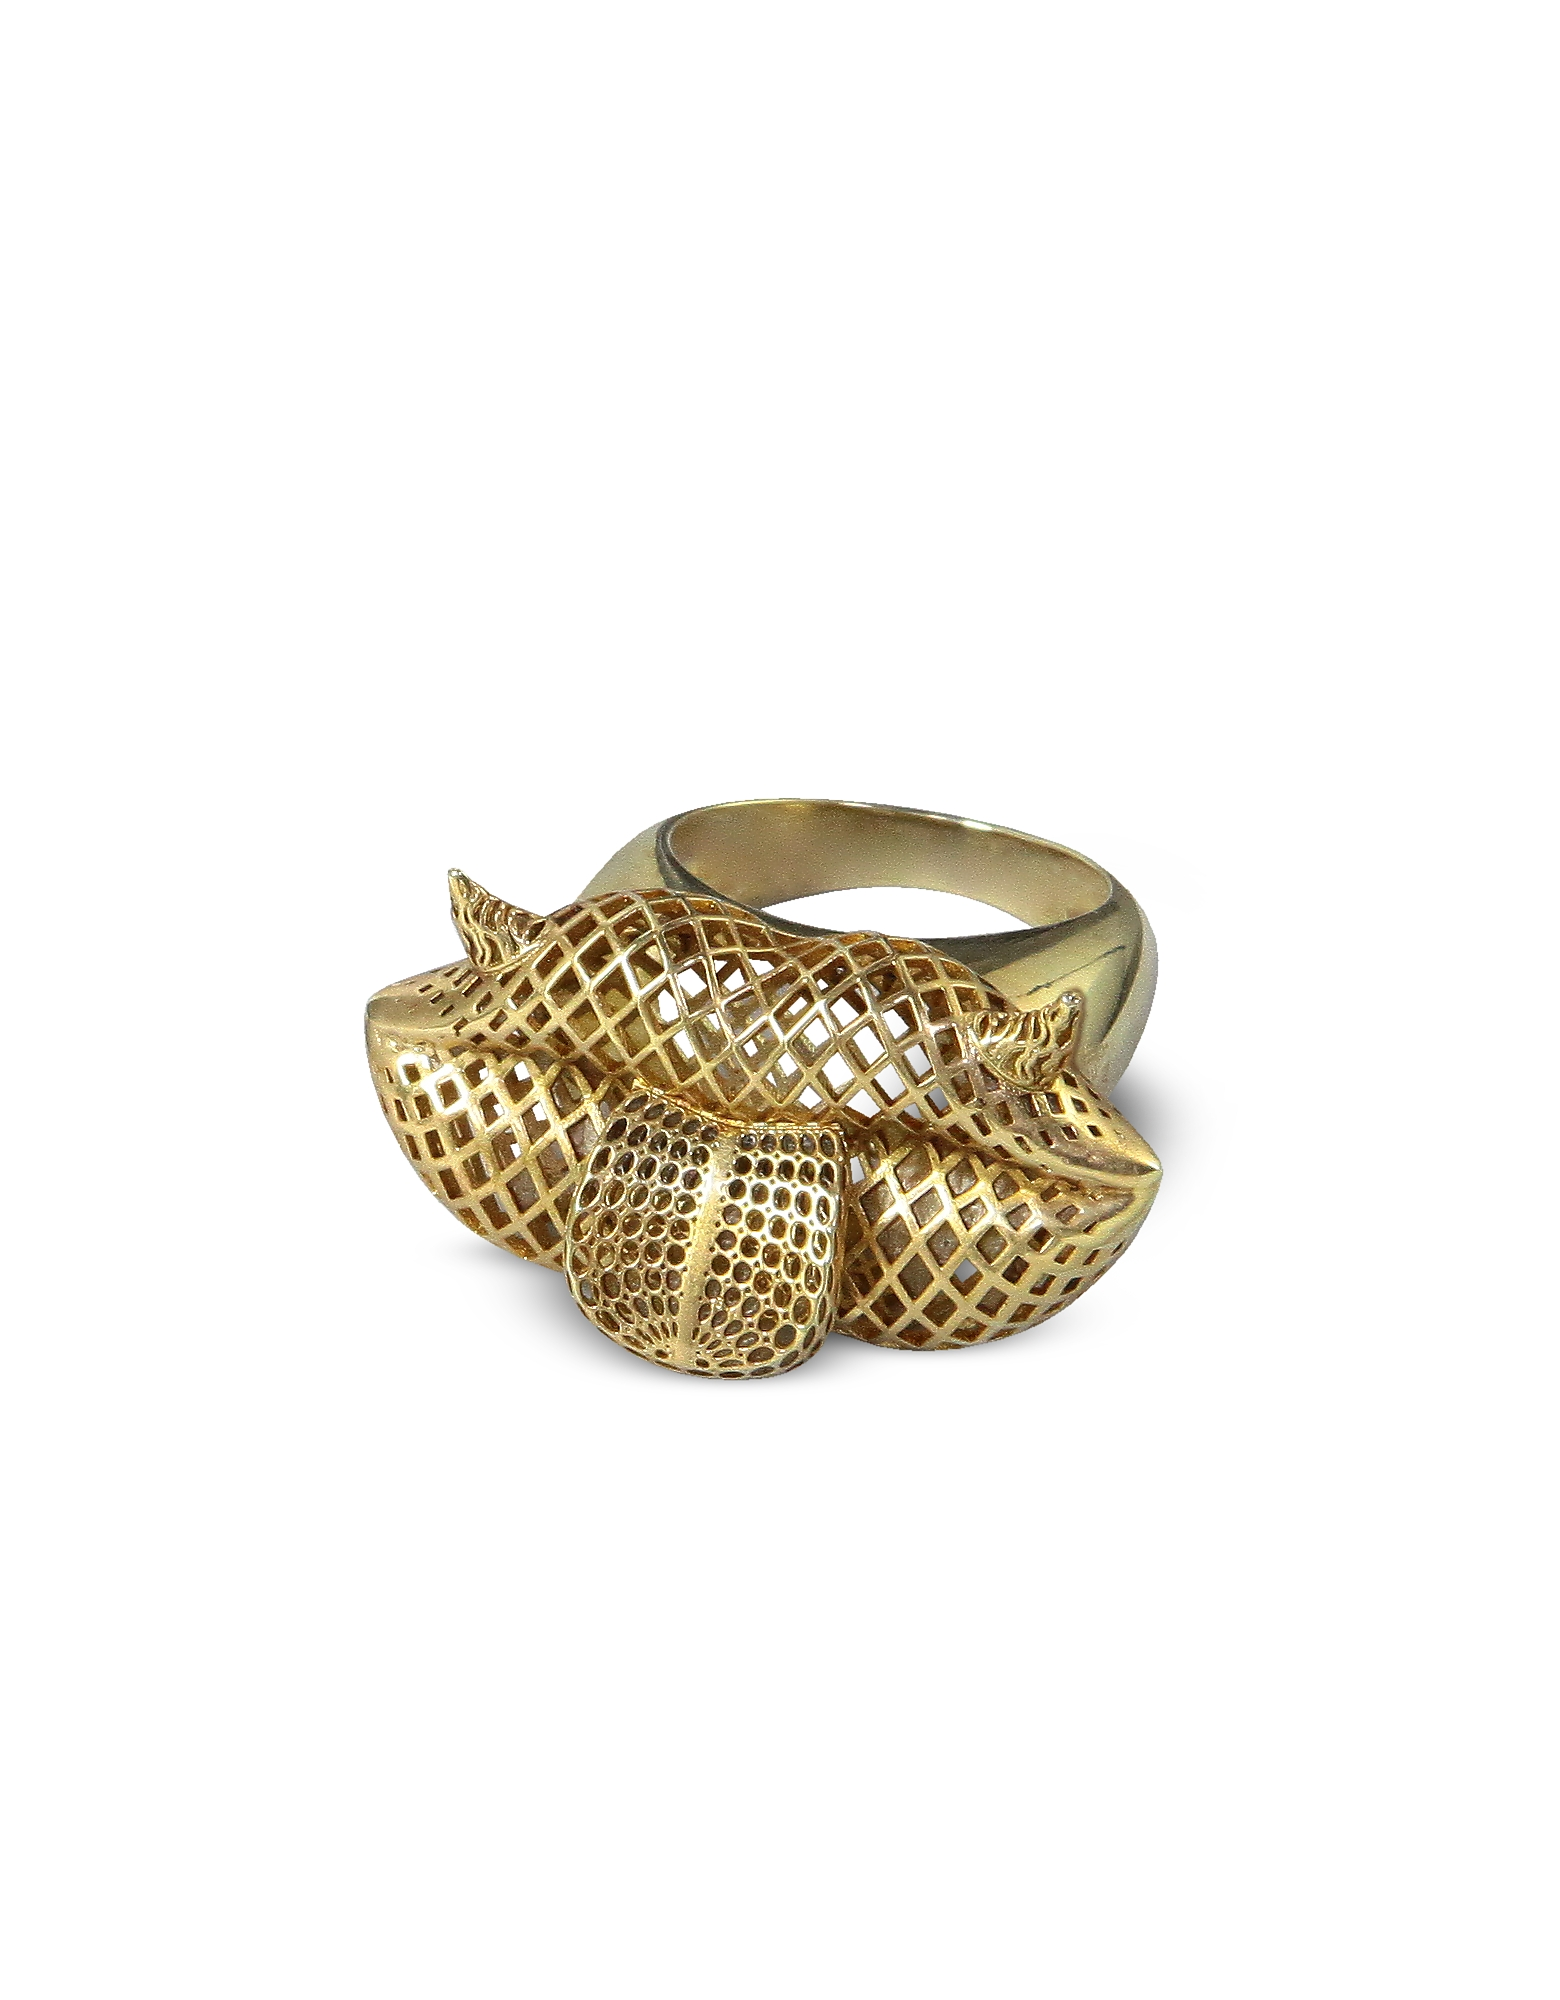 Maissa 戒指, Mr. Lips 戒指